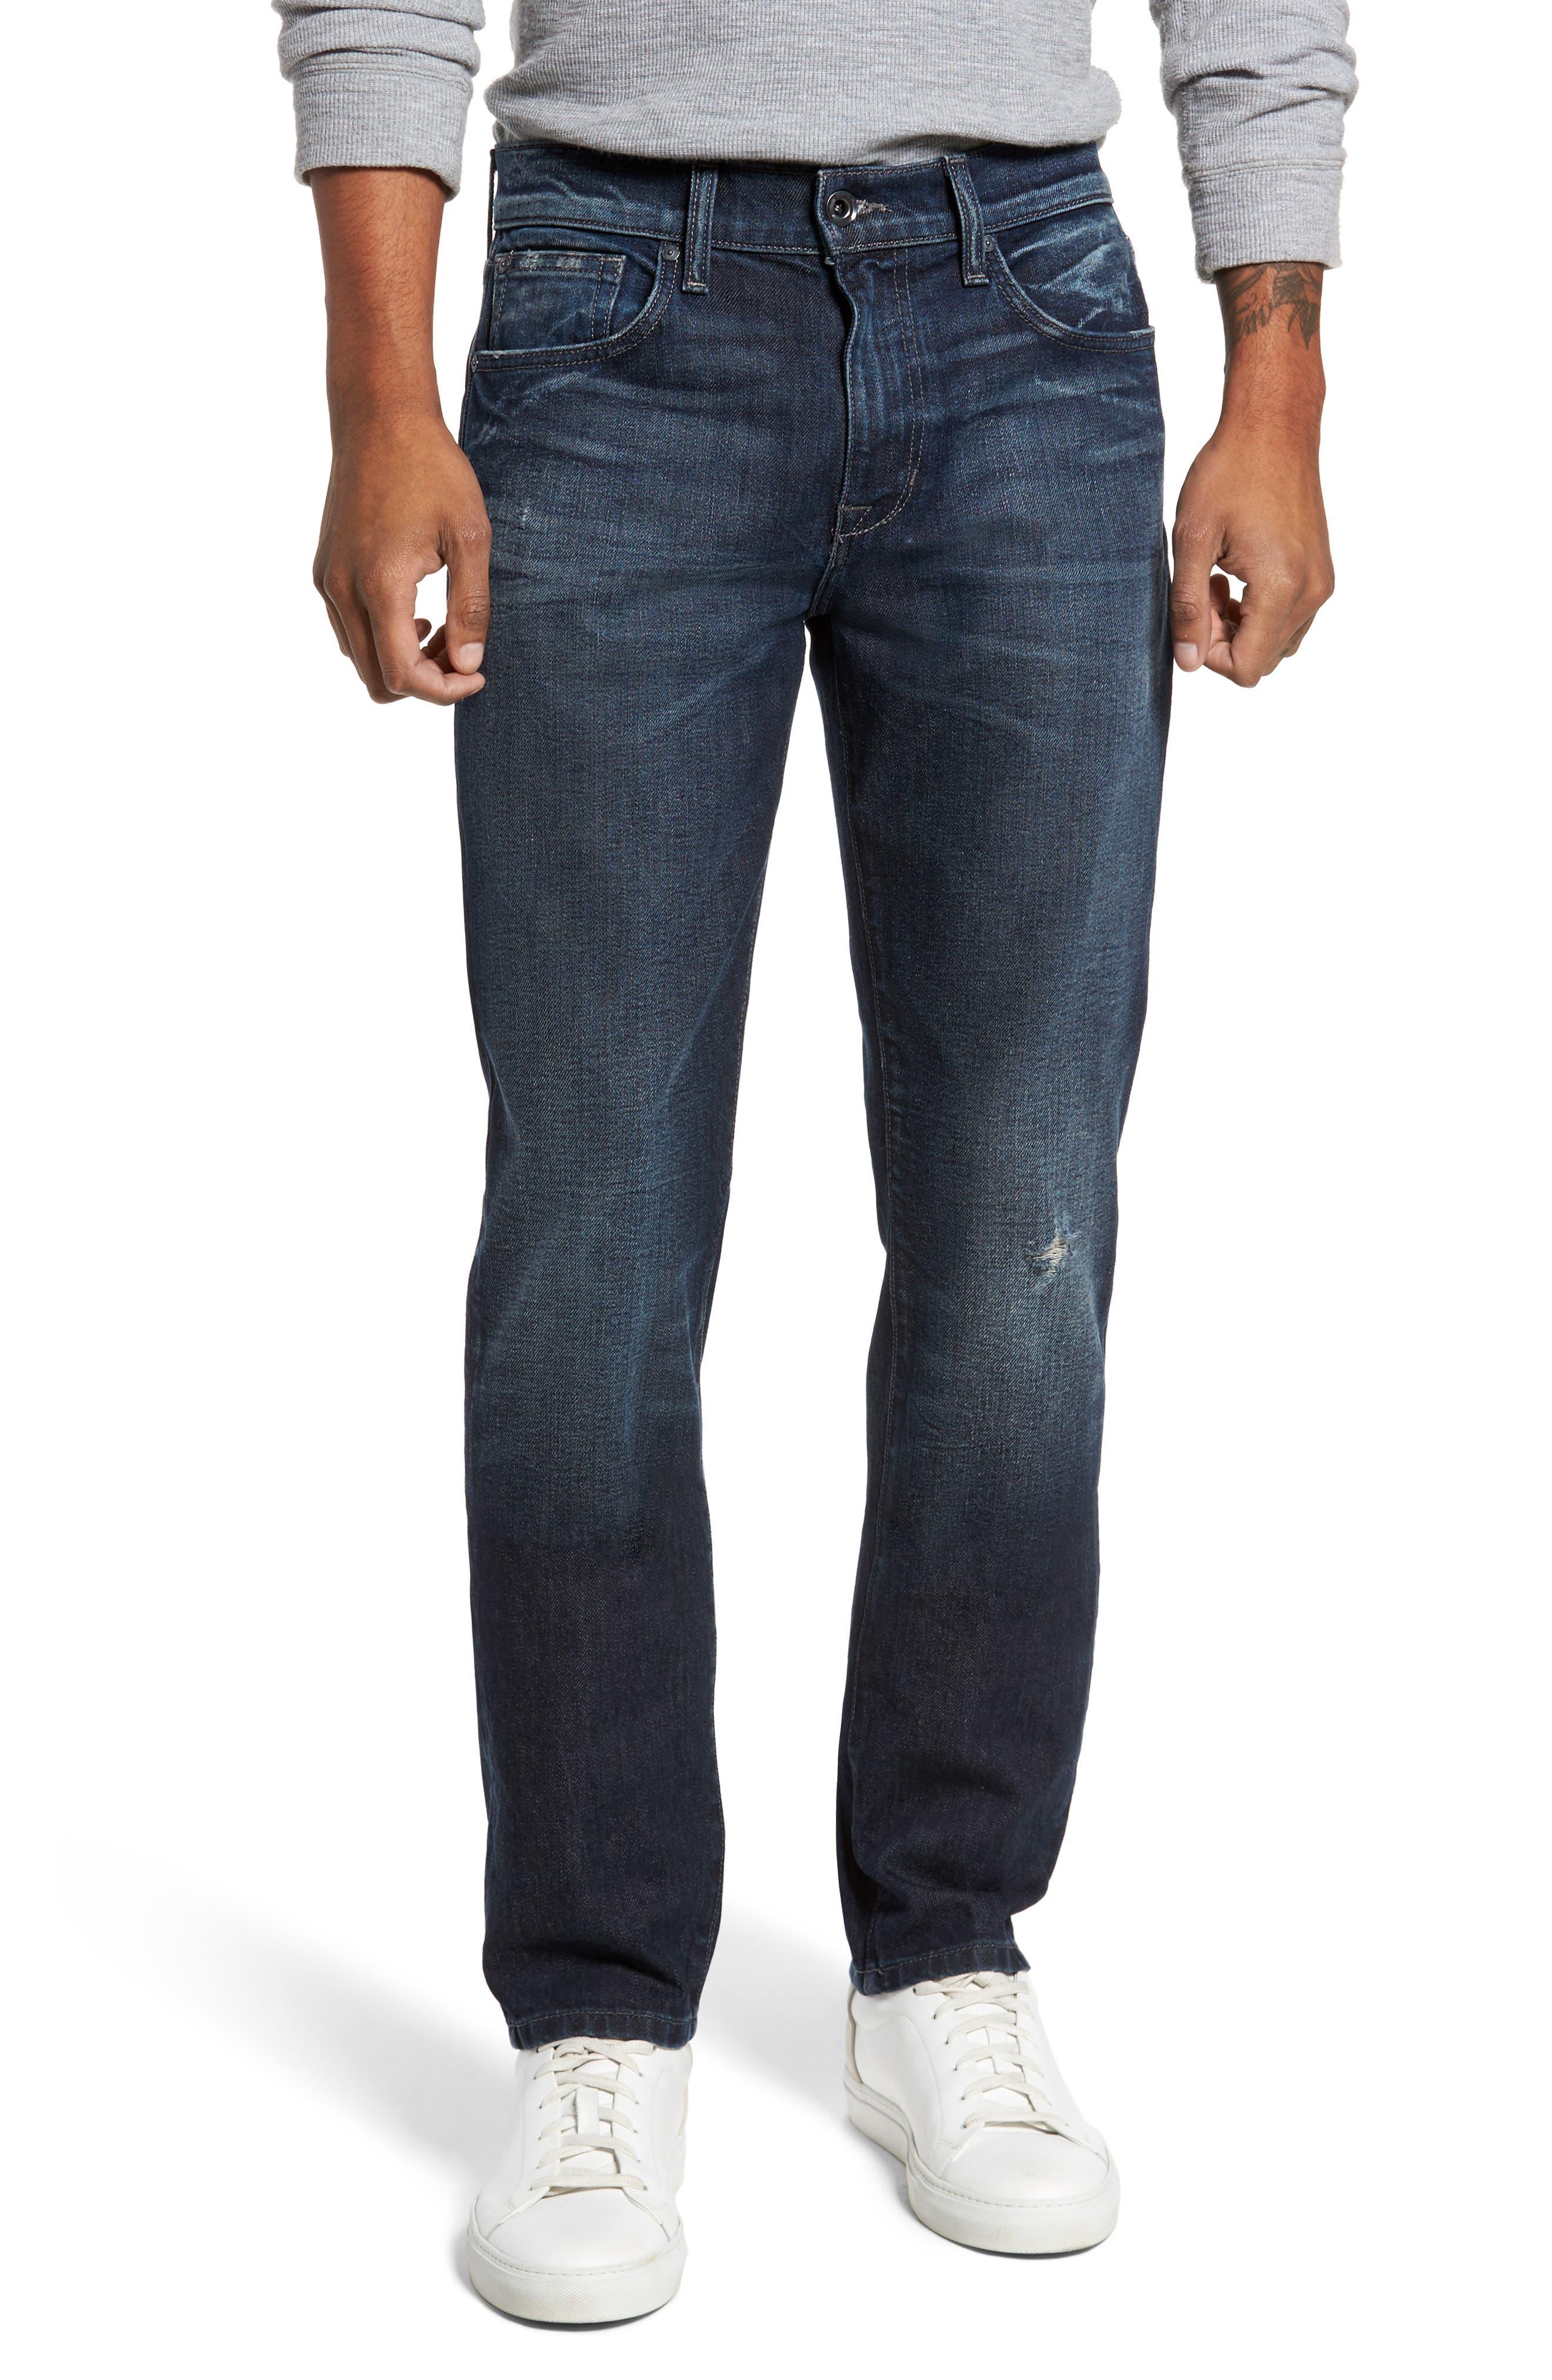 Brixton Slim Straight Leg Jeans,                             Main thumbnail 1, color,                             415